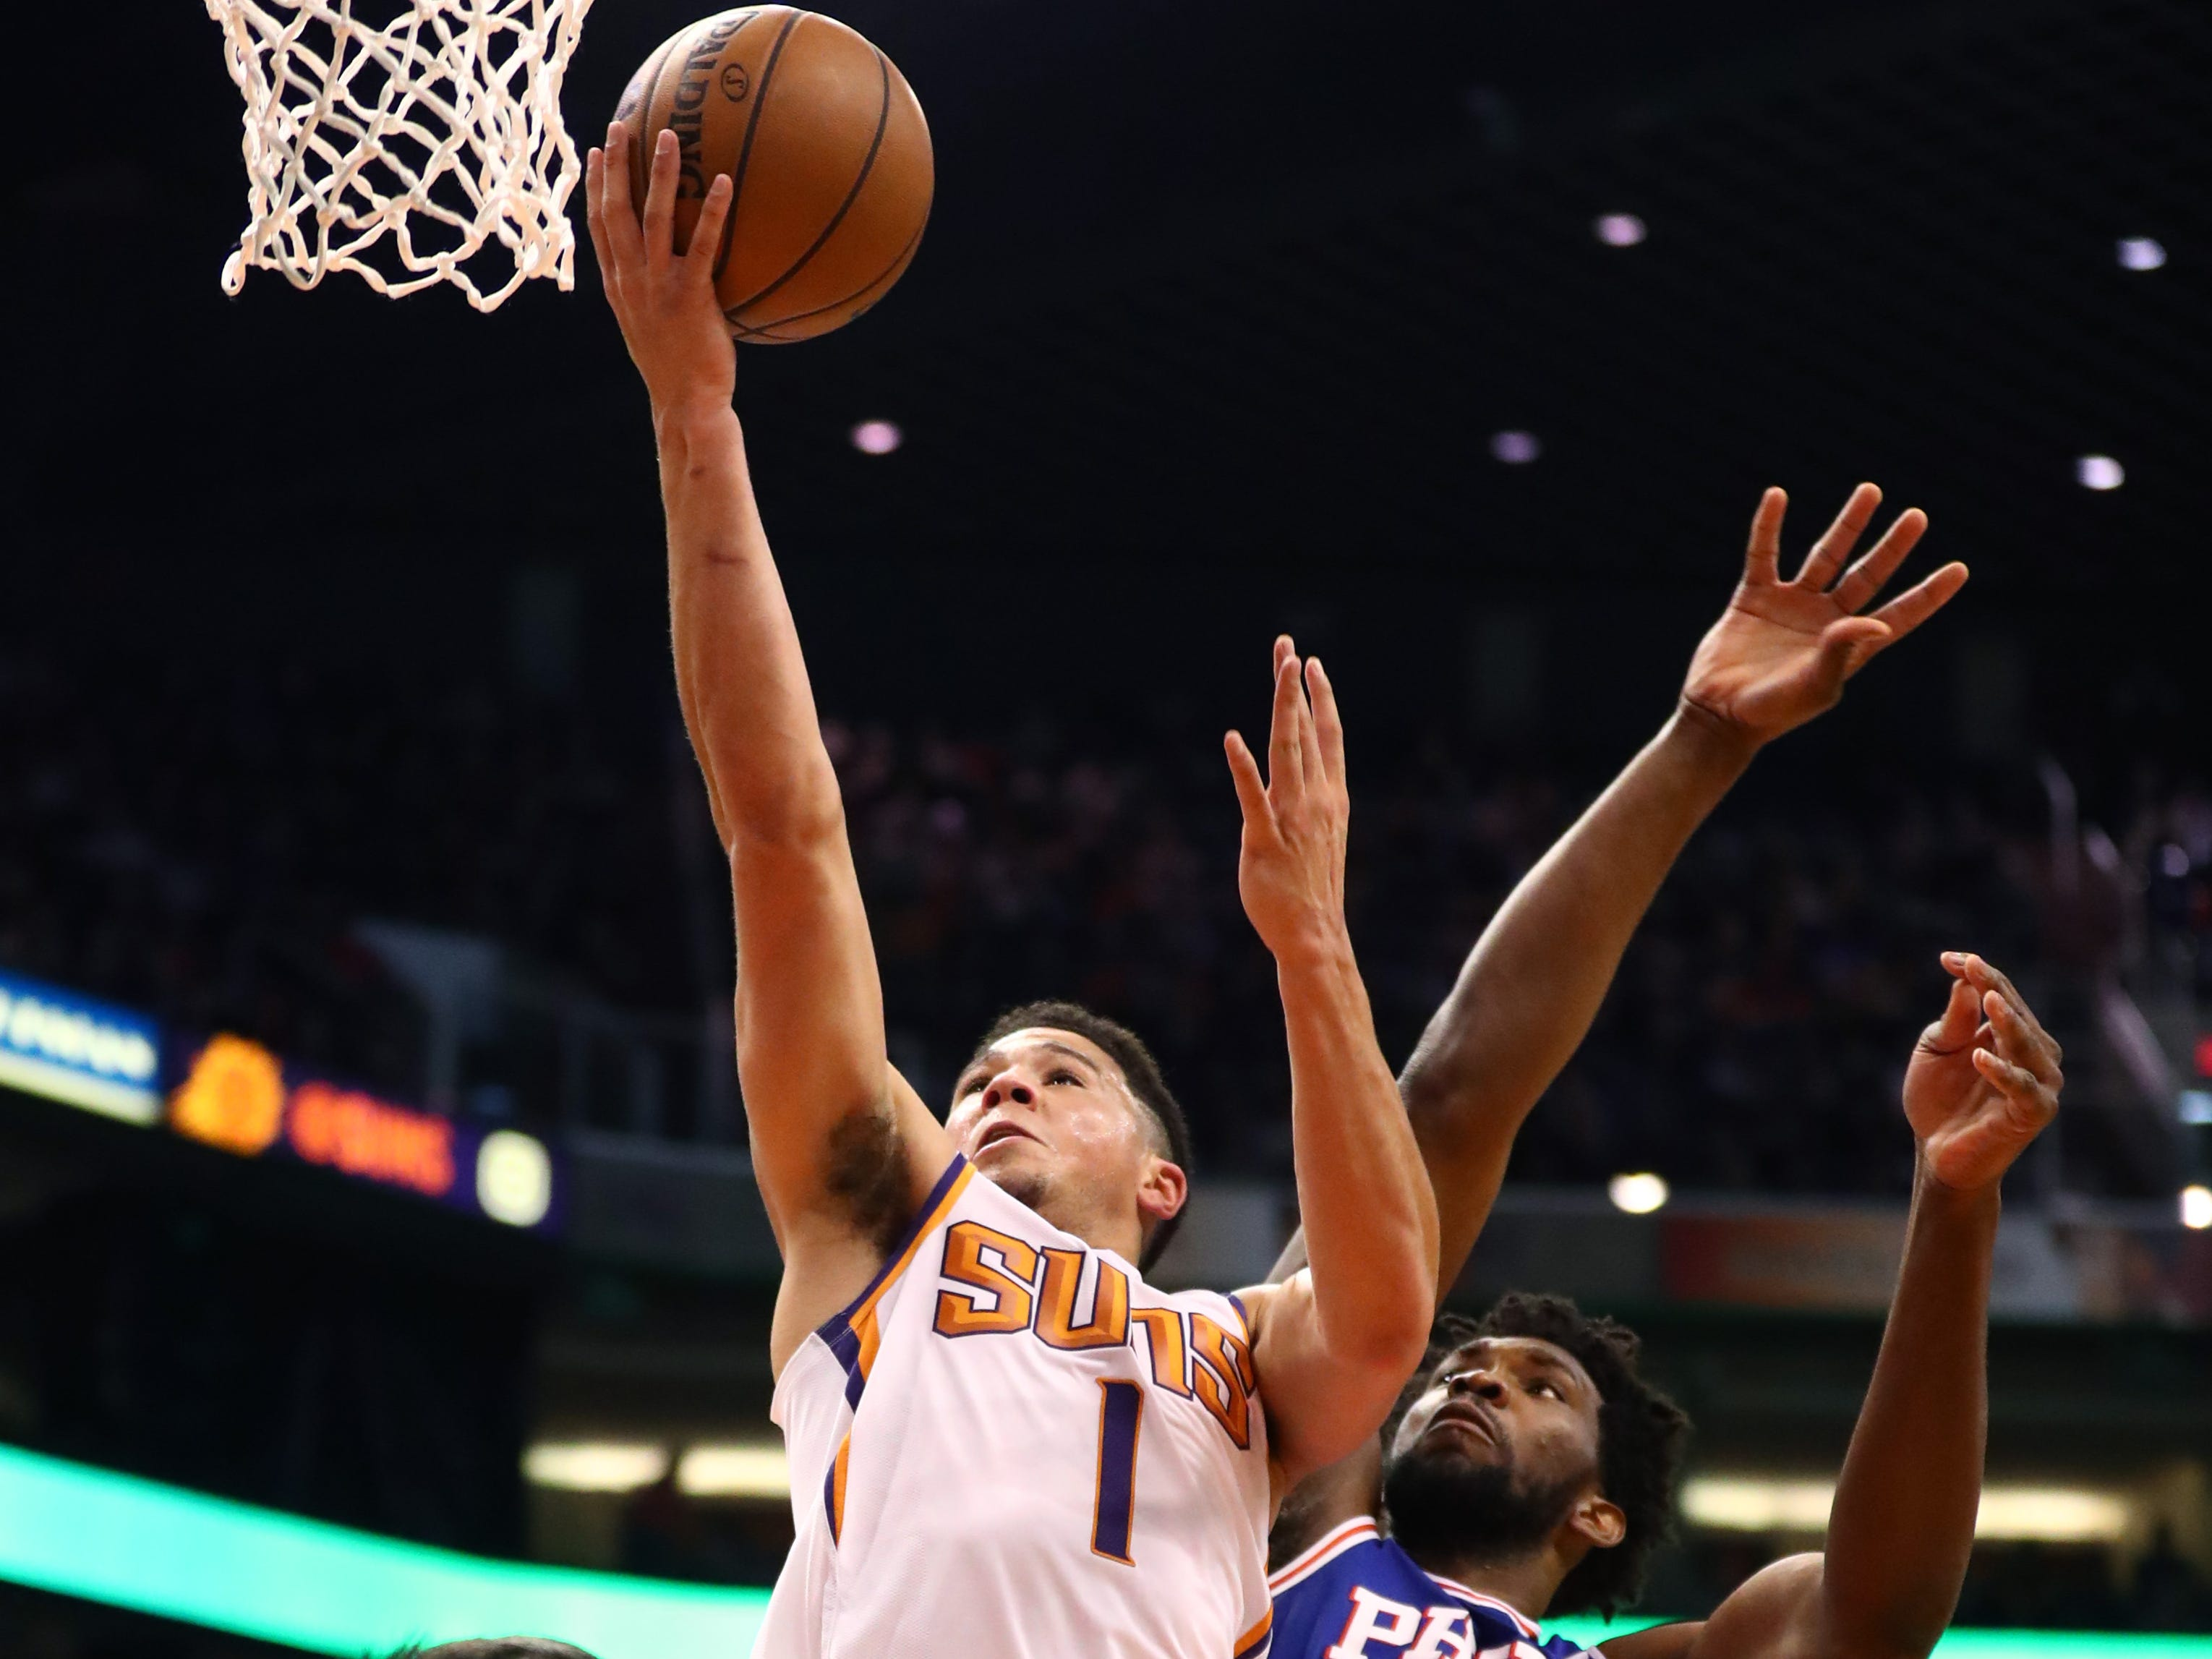 Jan 2, 2019; Phoenix, AZ, USA; Phoenix Suns guard Devin Booker (1) against Philadelphia 76ers center Joel Embiid (21)  in the first half at Talking Stick Resort Arena. Mandatory Credit: Mark J. Rebilas-USA TODAY Sports